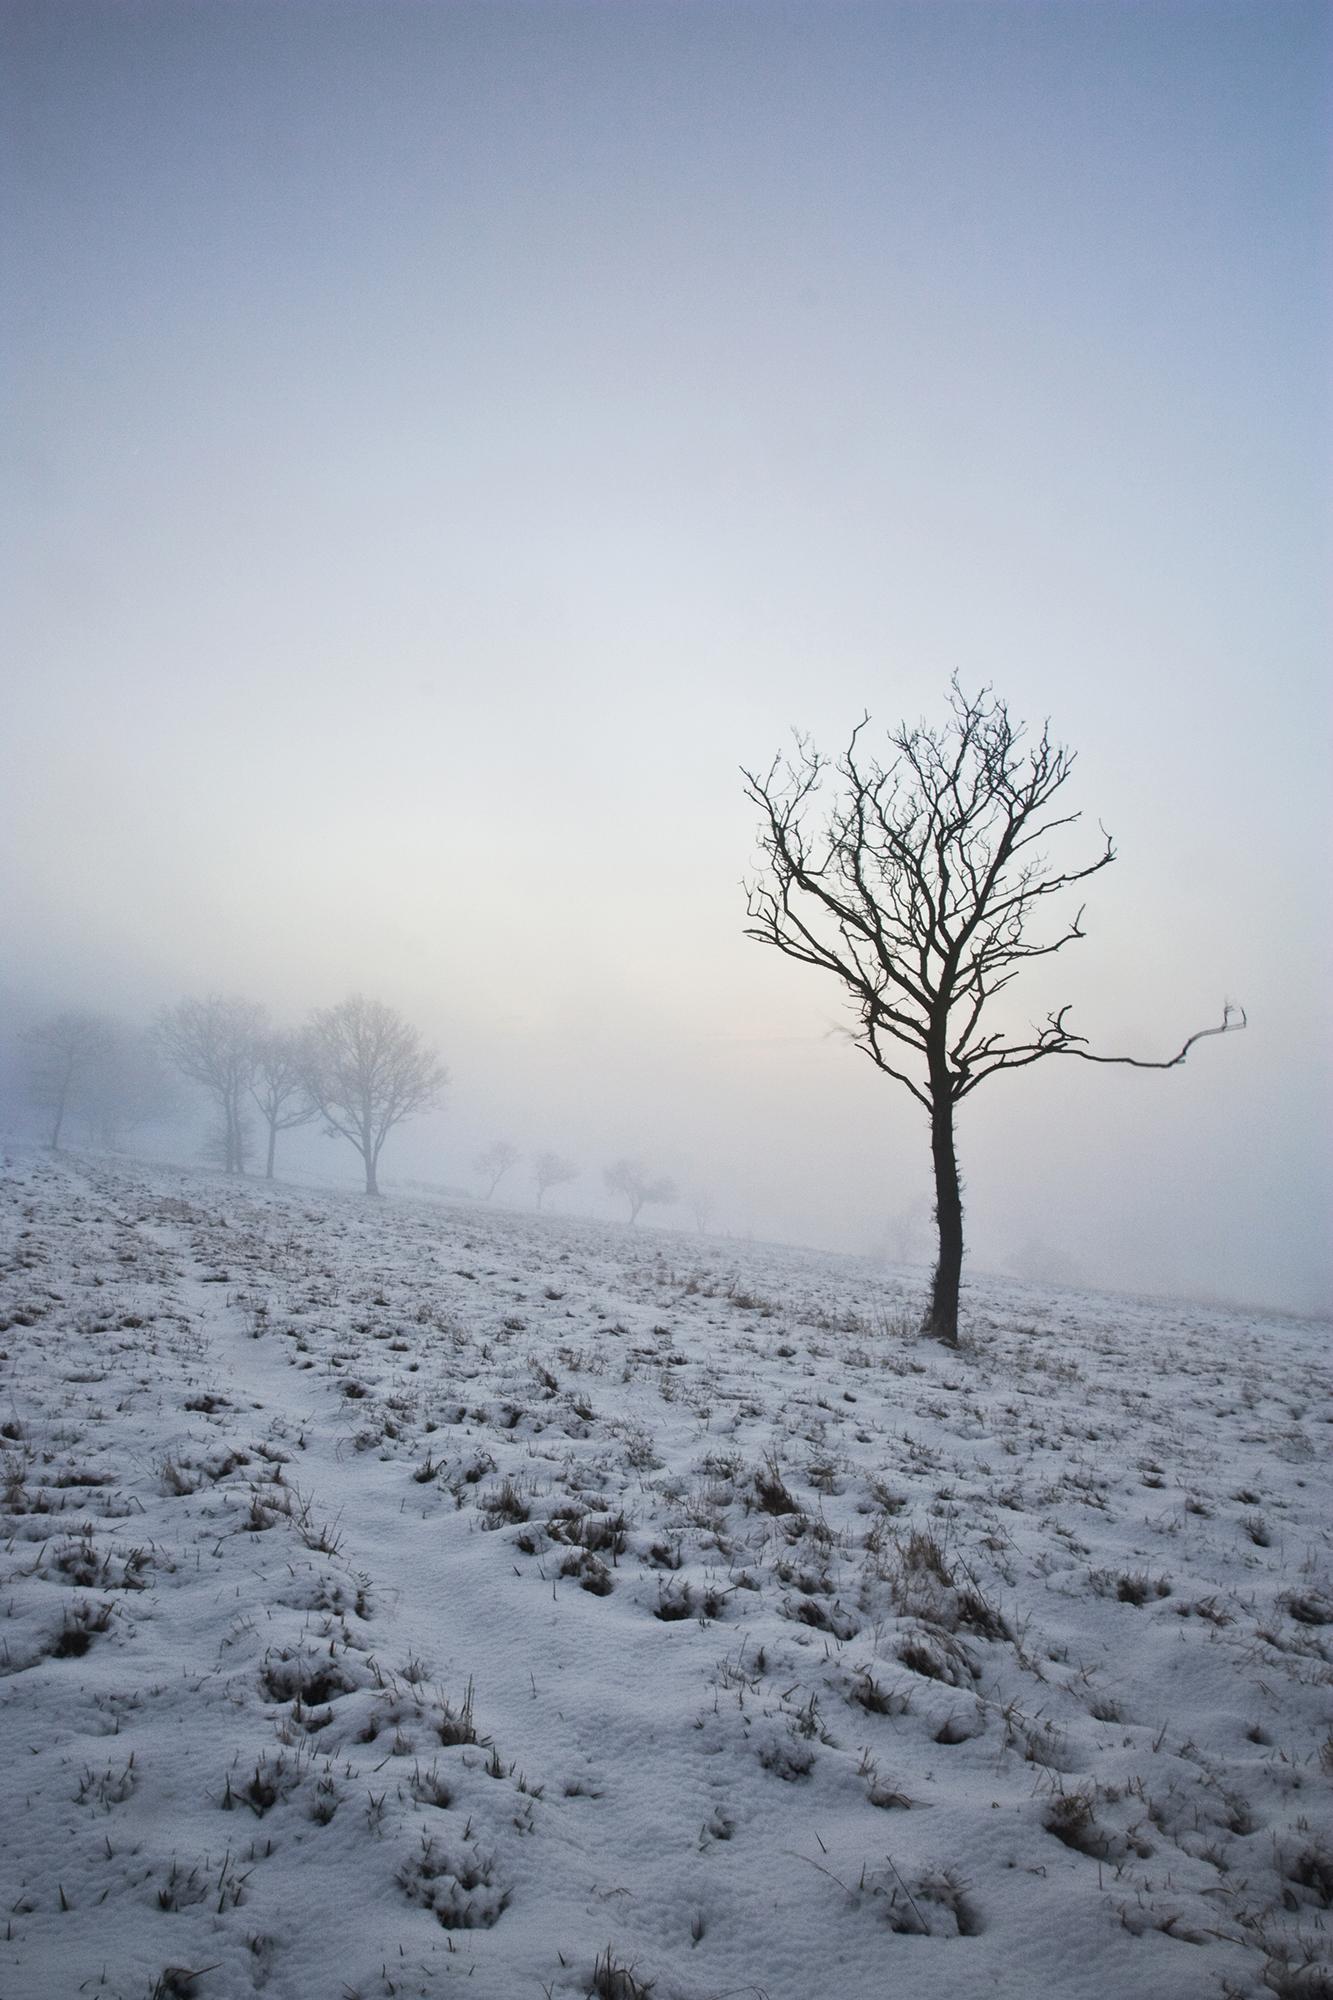 downs winter_3.jpg